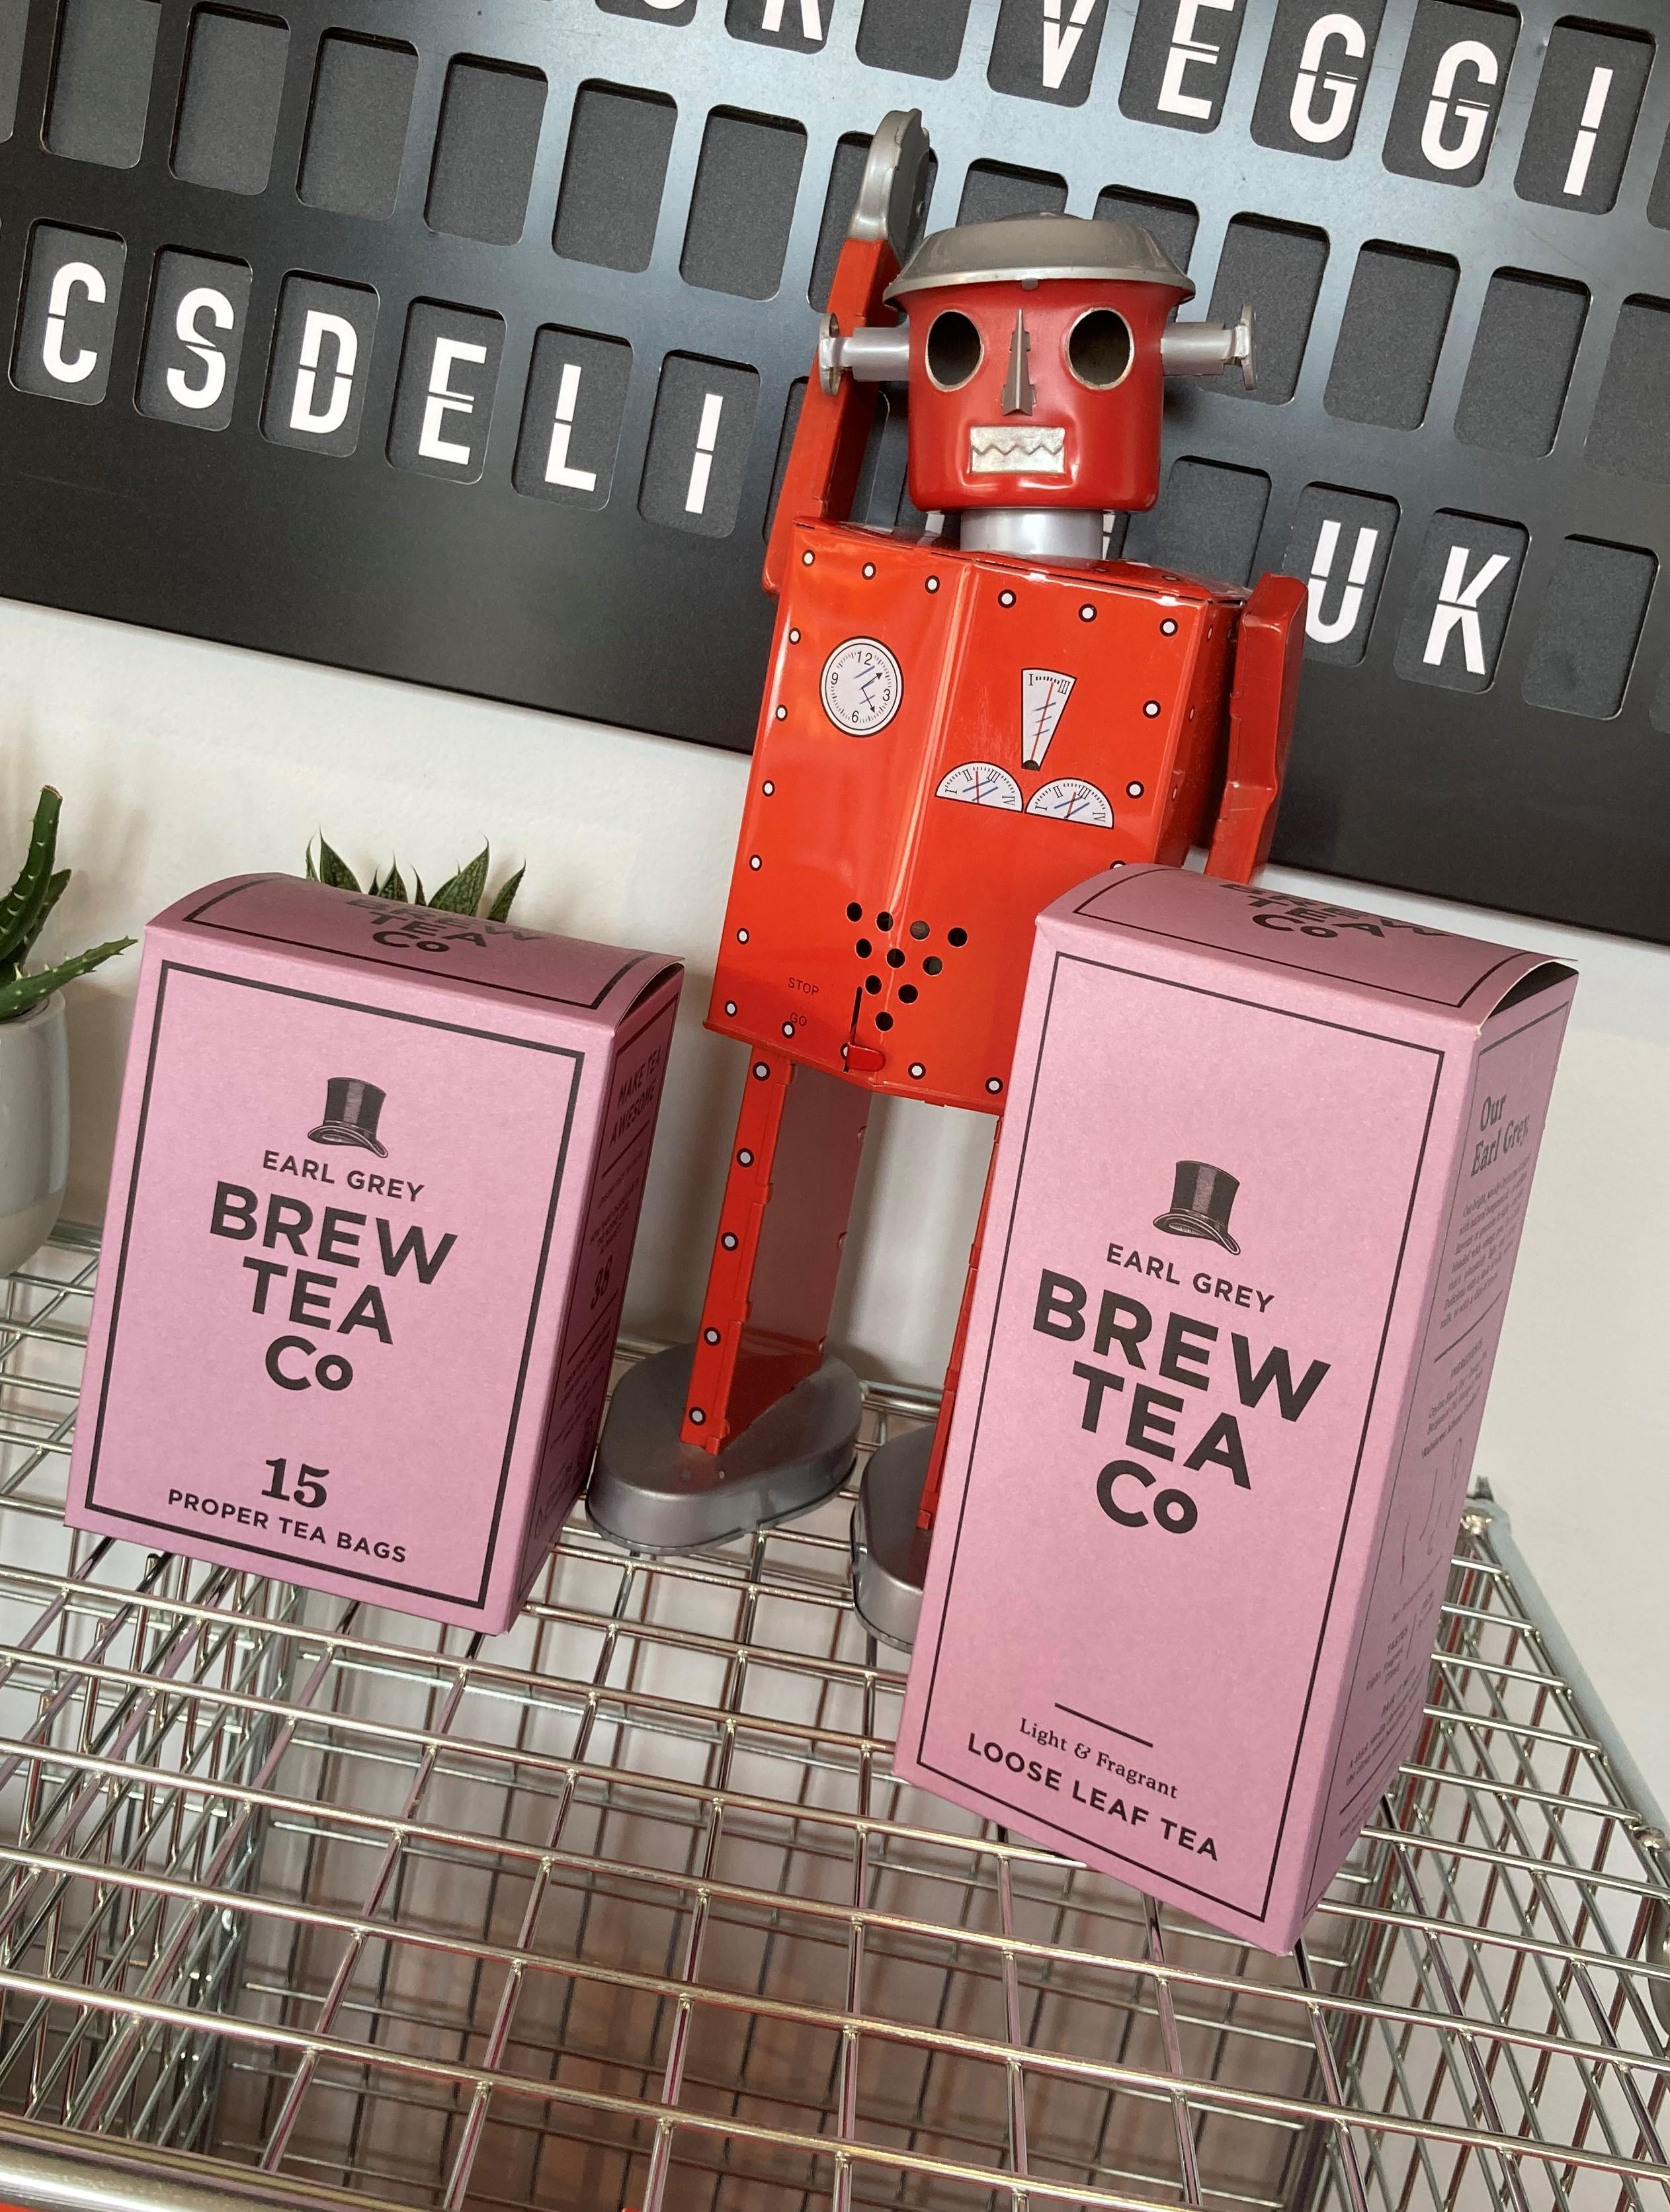 Brew Tea Co Earl Grey - 15 Bags